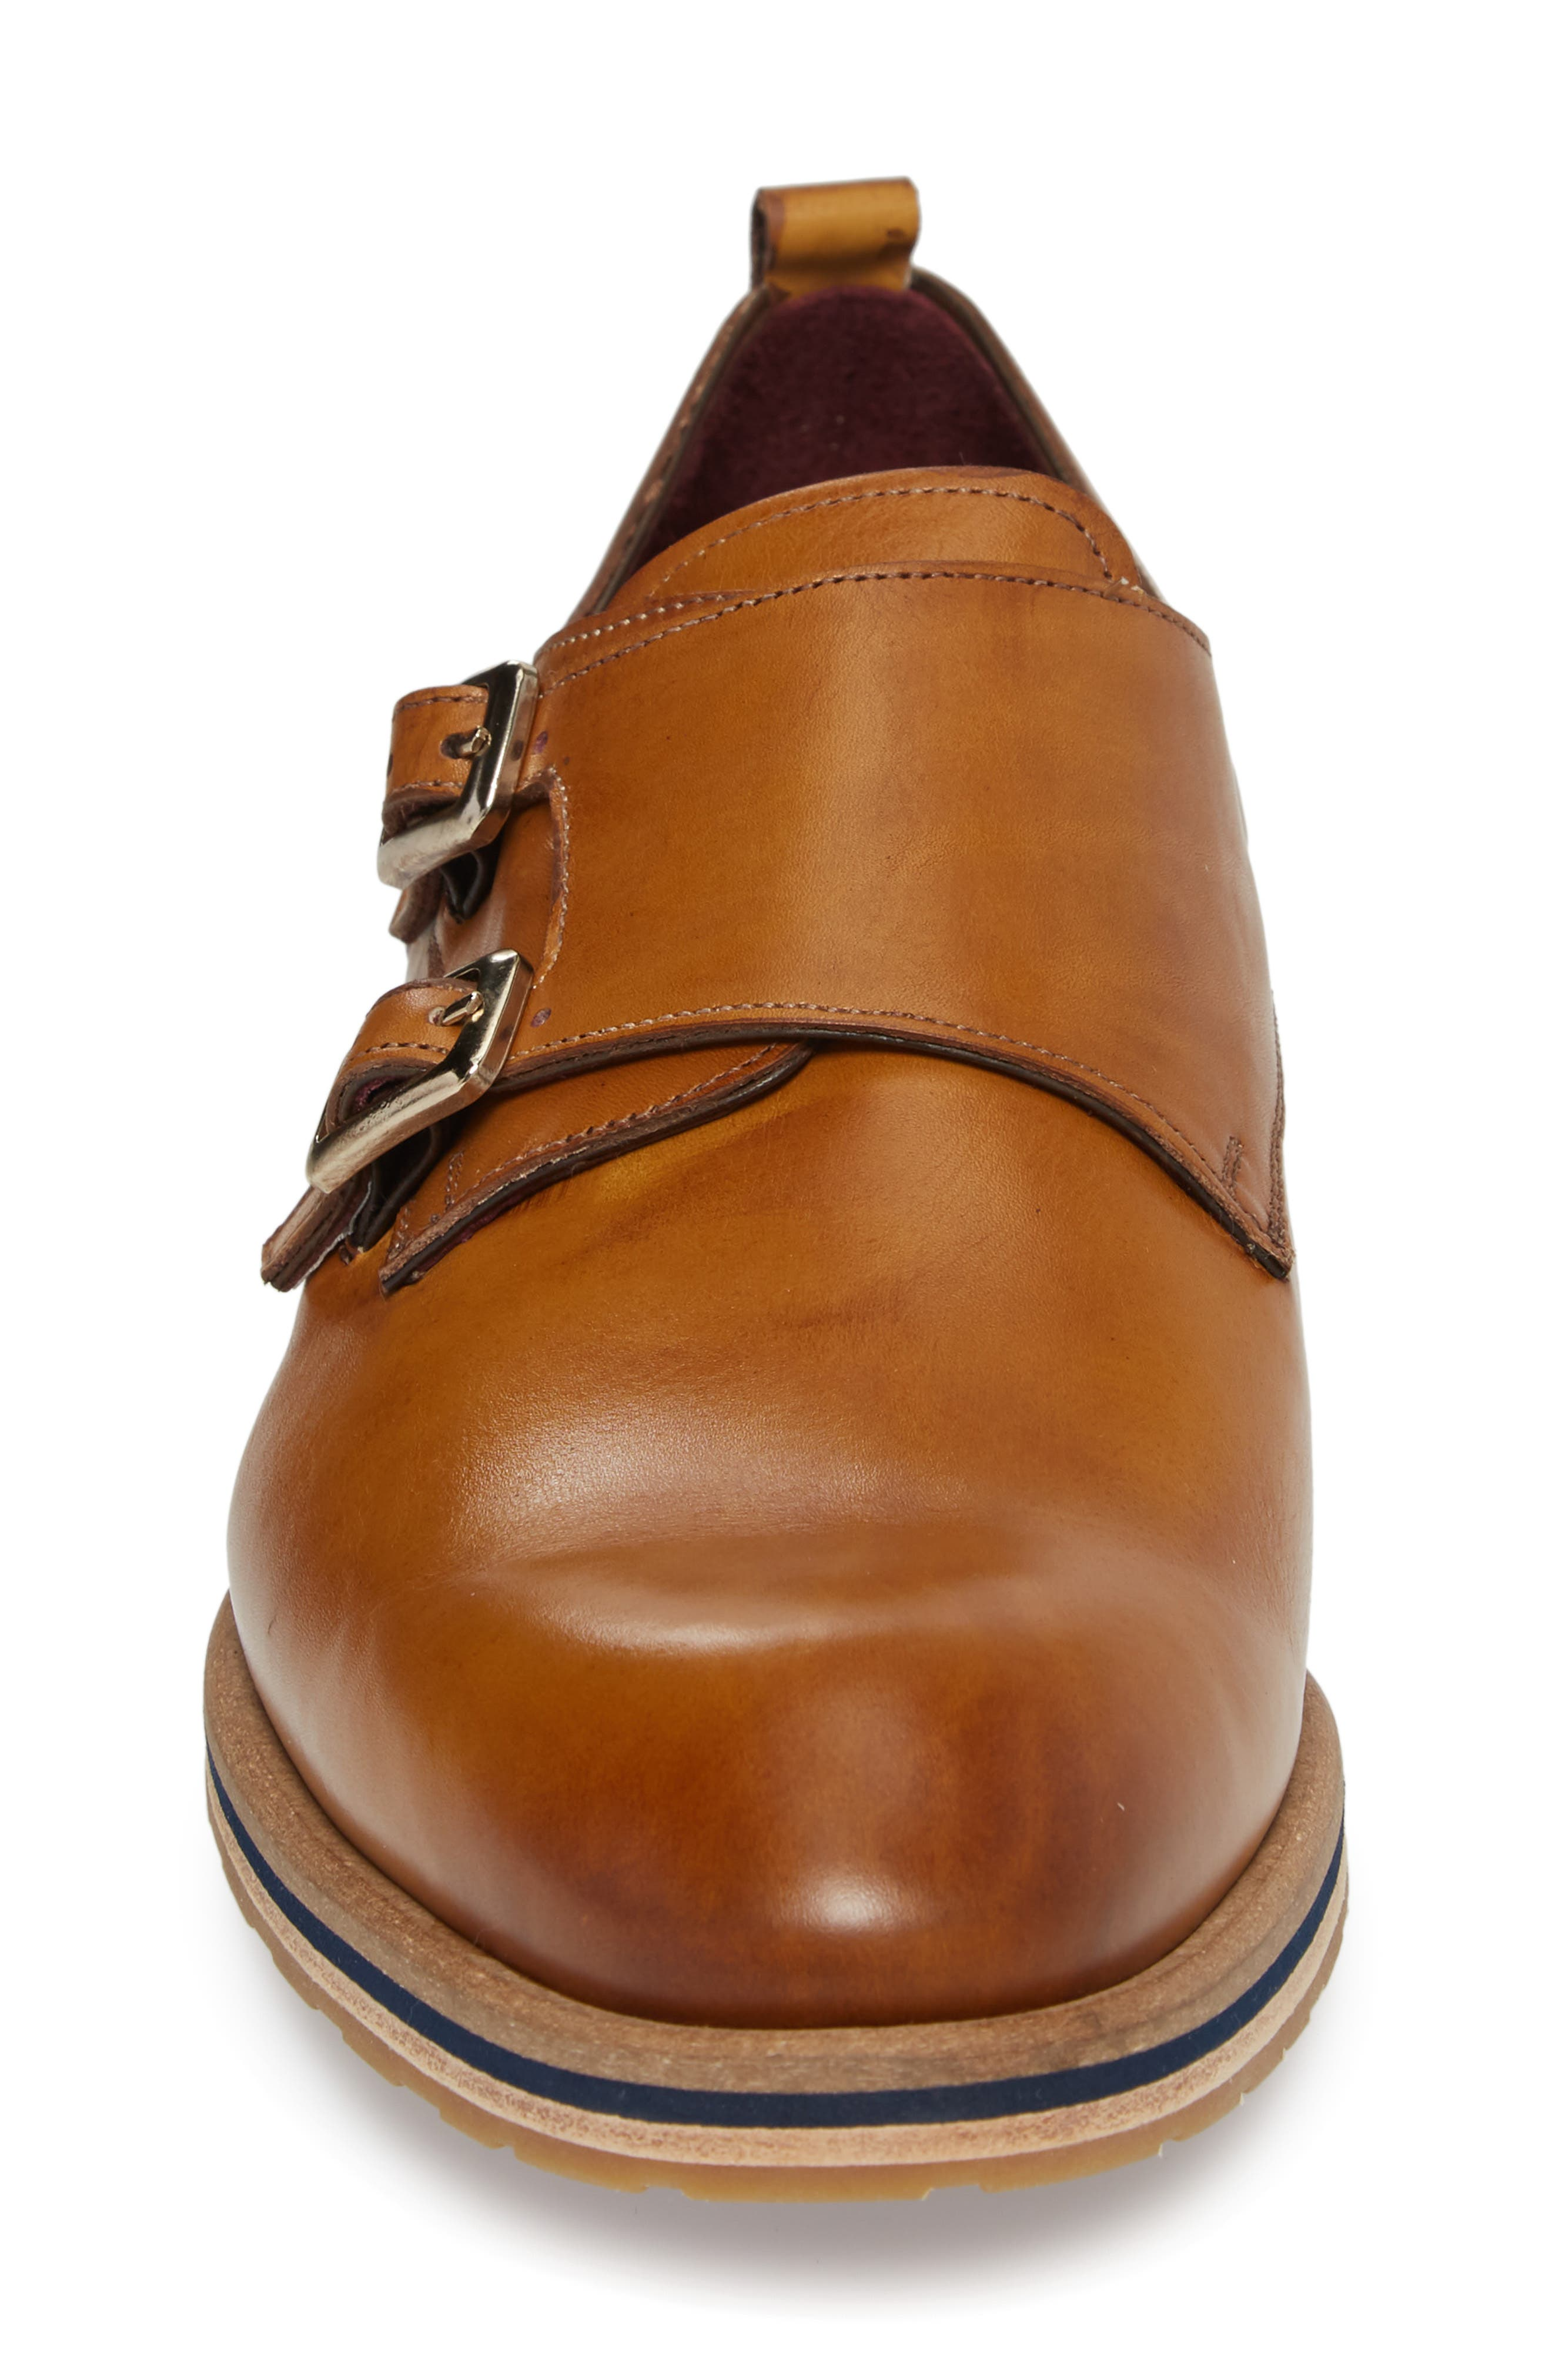 Apolo Double Buckle Monk Shoe,                             Alternate thumbnail 4, color,                             Honey Leather